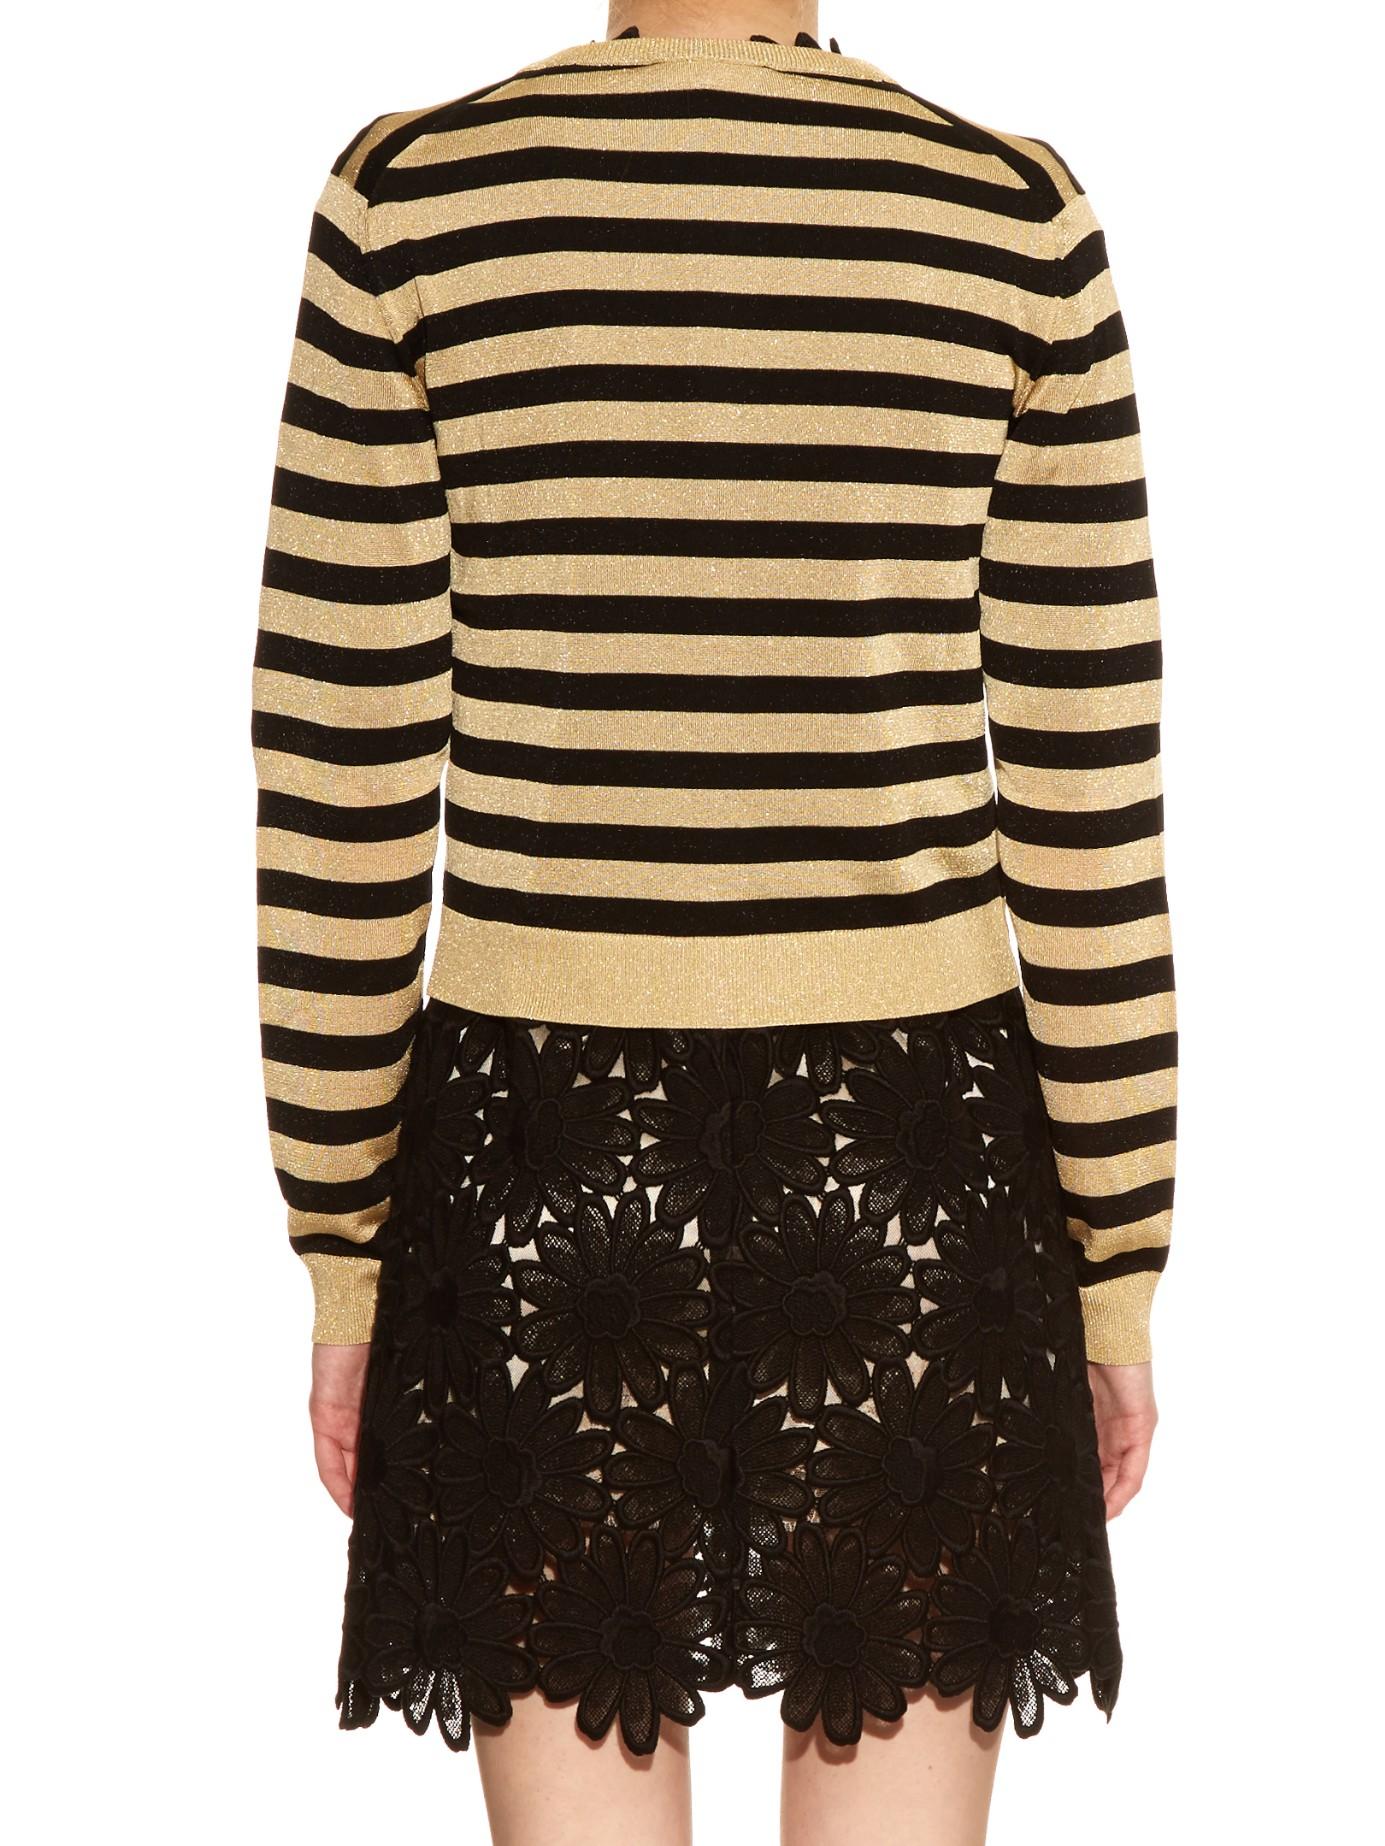 Dolce & gabbana Metallic-stripe Fine-knit Cardigan in Black | Lyst